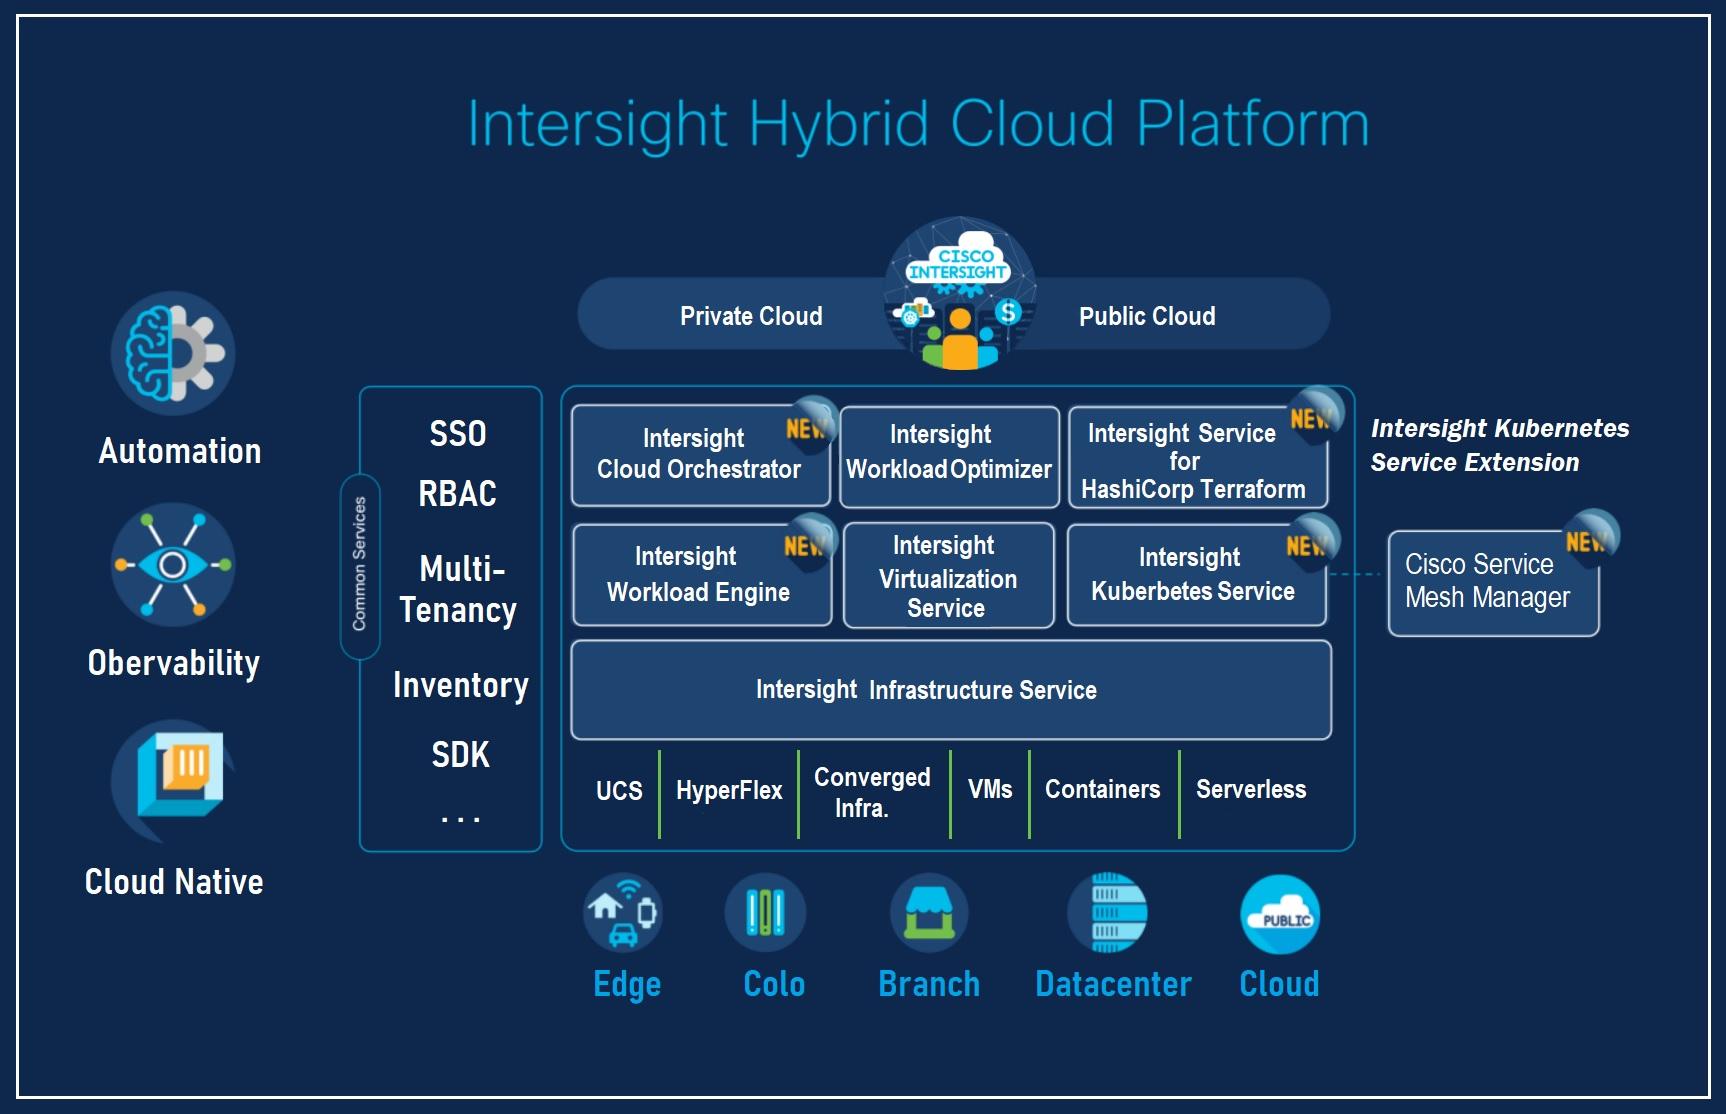 Intersight Hybrid Cloud Platform